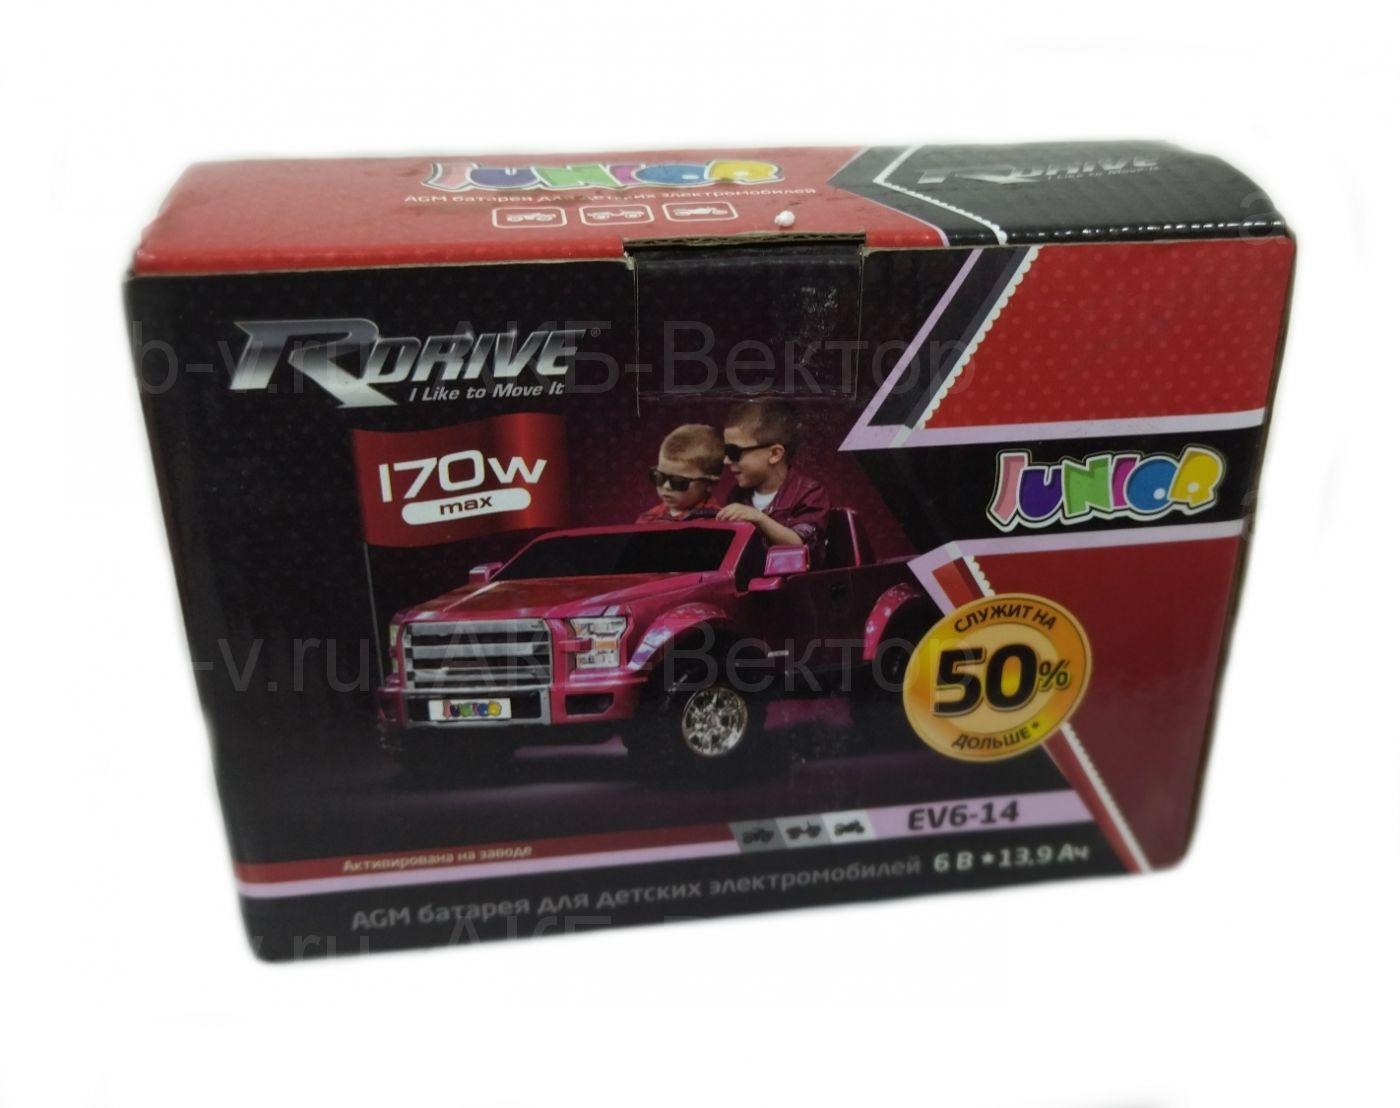 RDrive Junior EV6-14 6V AGM батарея для детских электромобилей глубокого разряда.